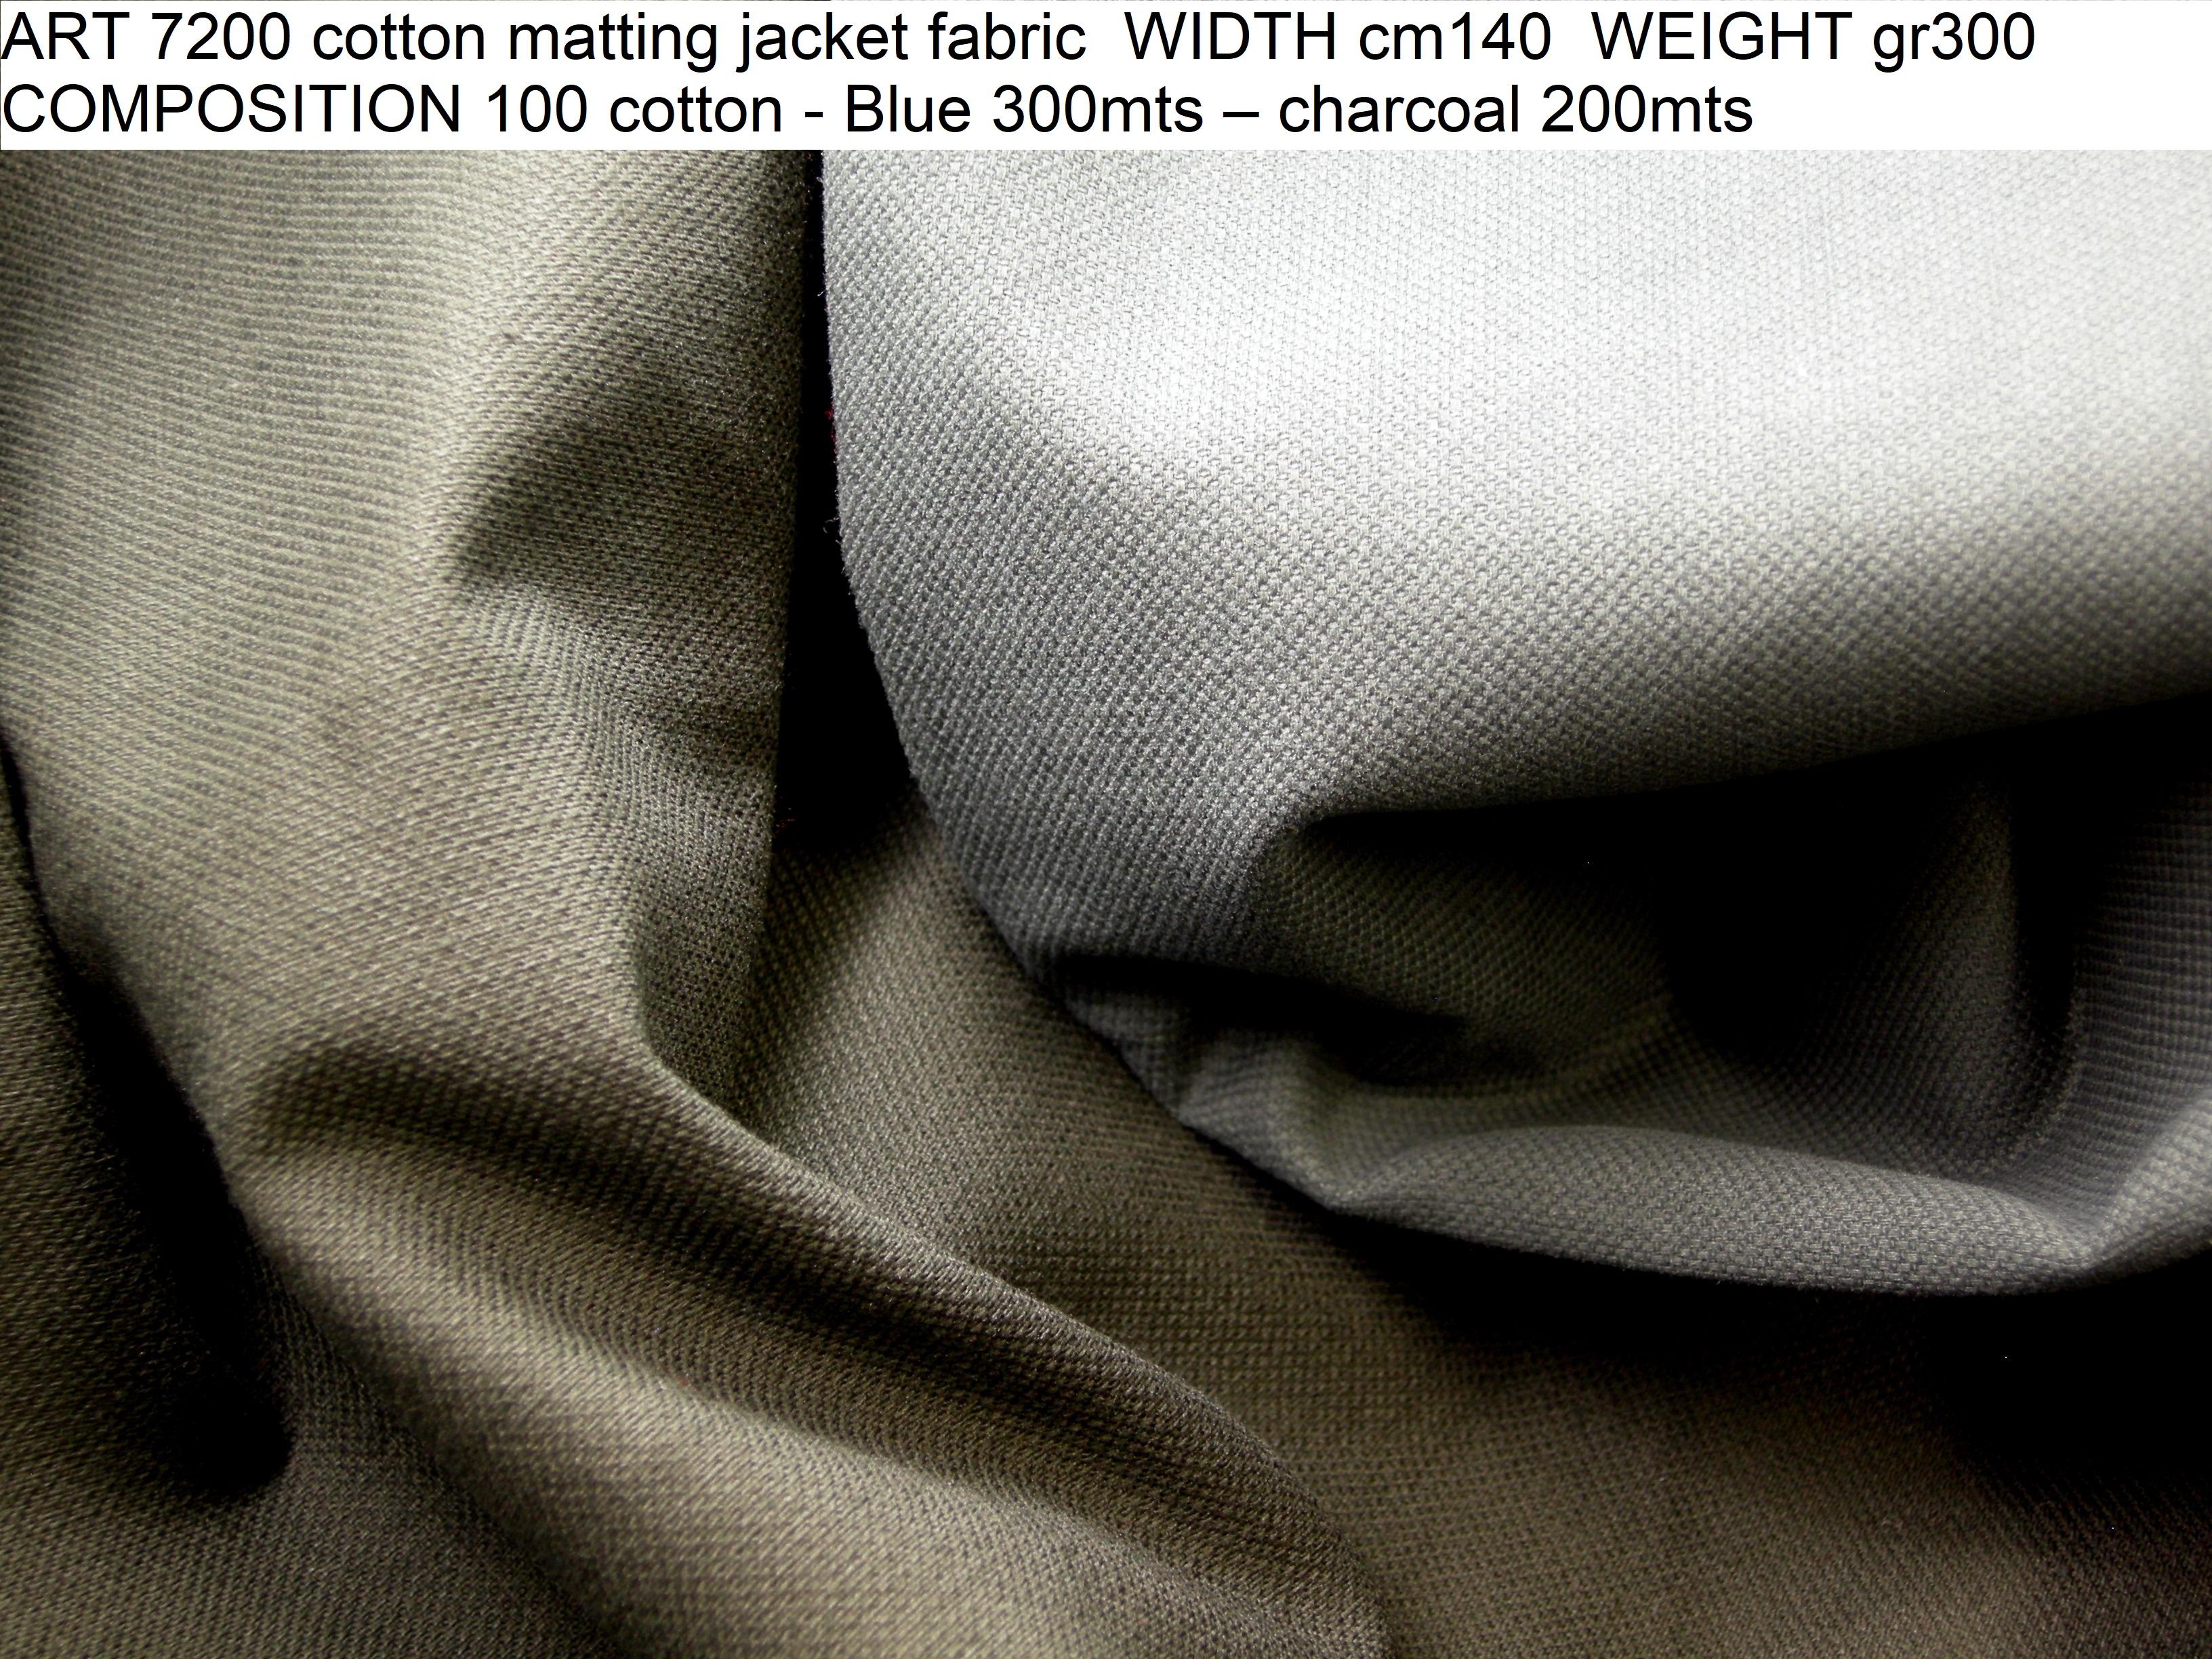 ART 7200 cotton matting jacket fabric WIDTH cm140 WEIGHT gr300 COMPOSITION 100 cotton - Blue 300mts – charcoal 200mts